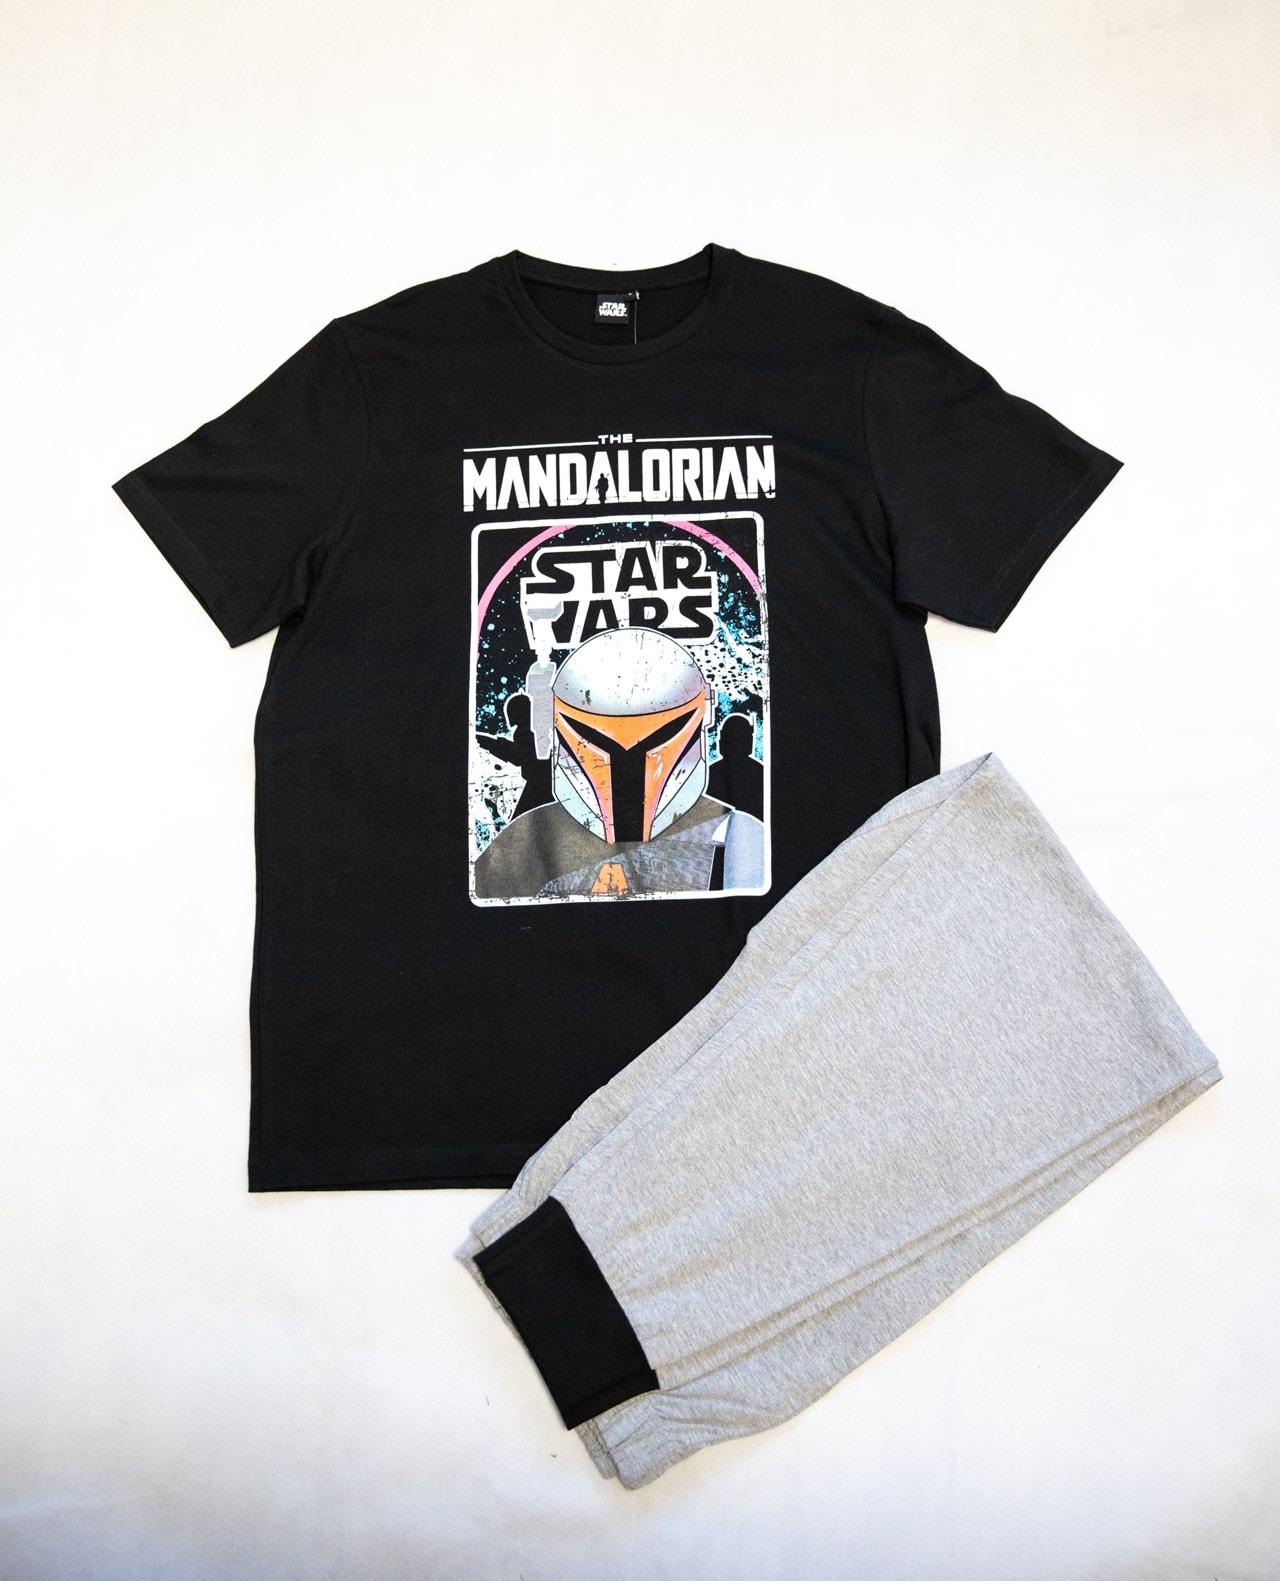 The Mandalorian: Star Wars Pyjama Set (Small) - 1